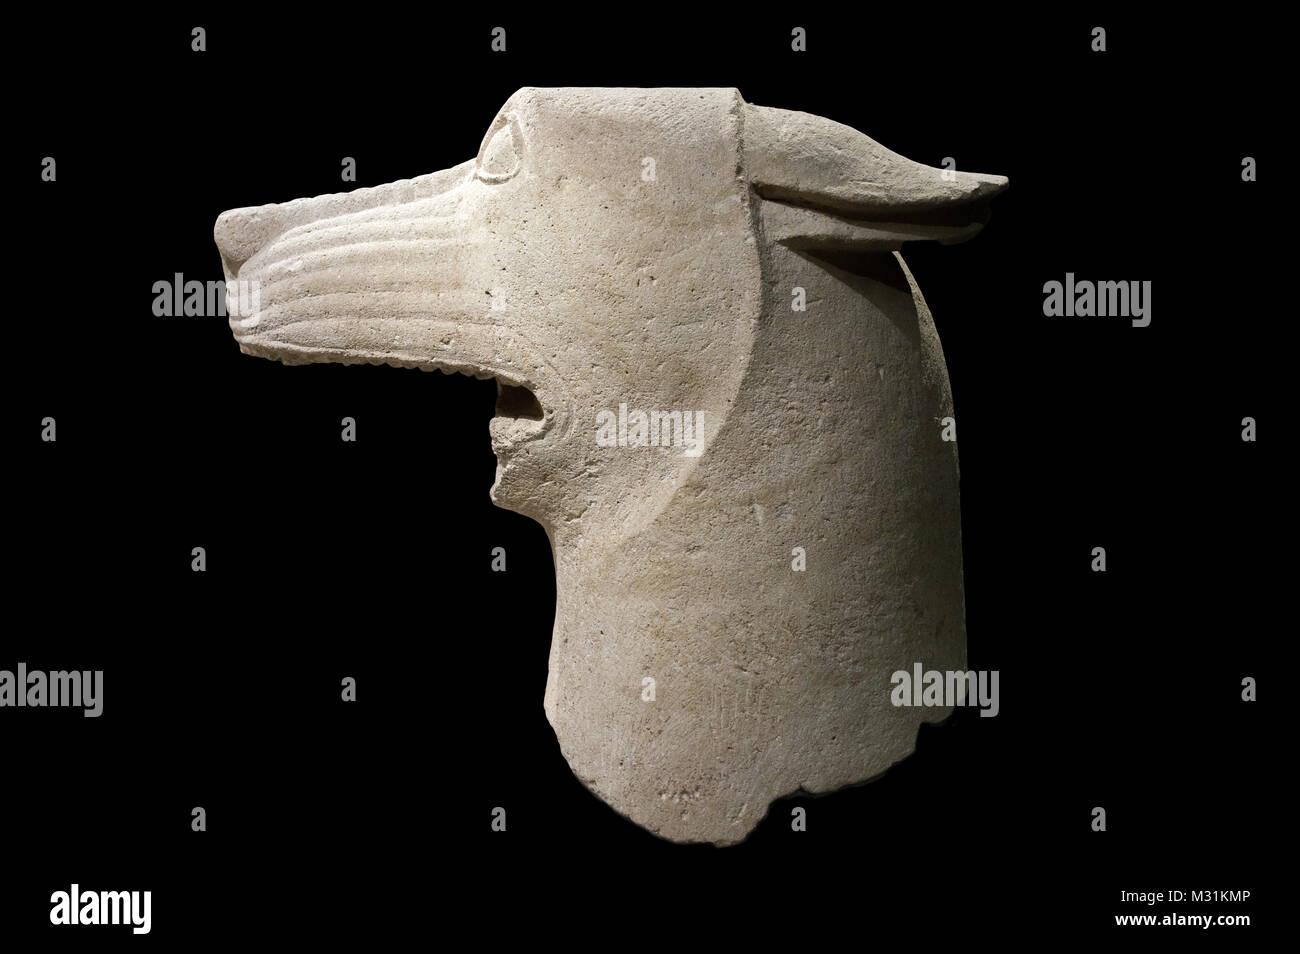 Jaen, Spain - December 29th, 2017: Wolf's head of Heroic Shrine of El Pajarillo, Huelma, Jaén at Iberian - Stock Image